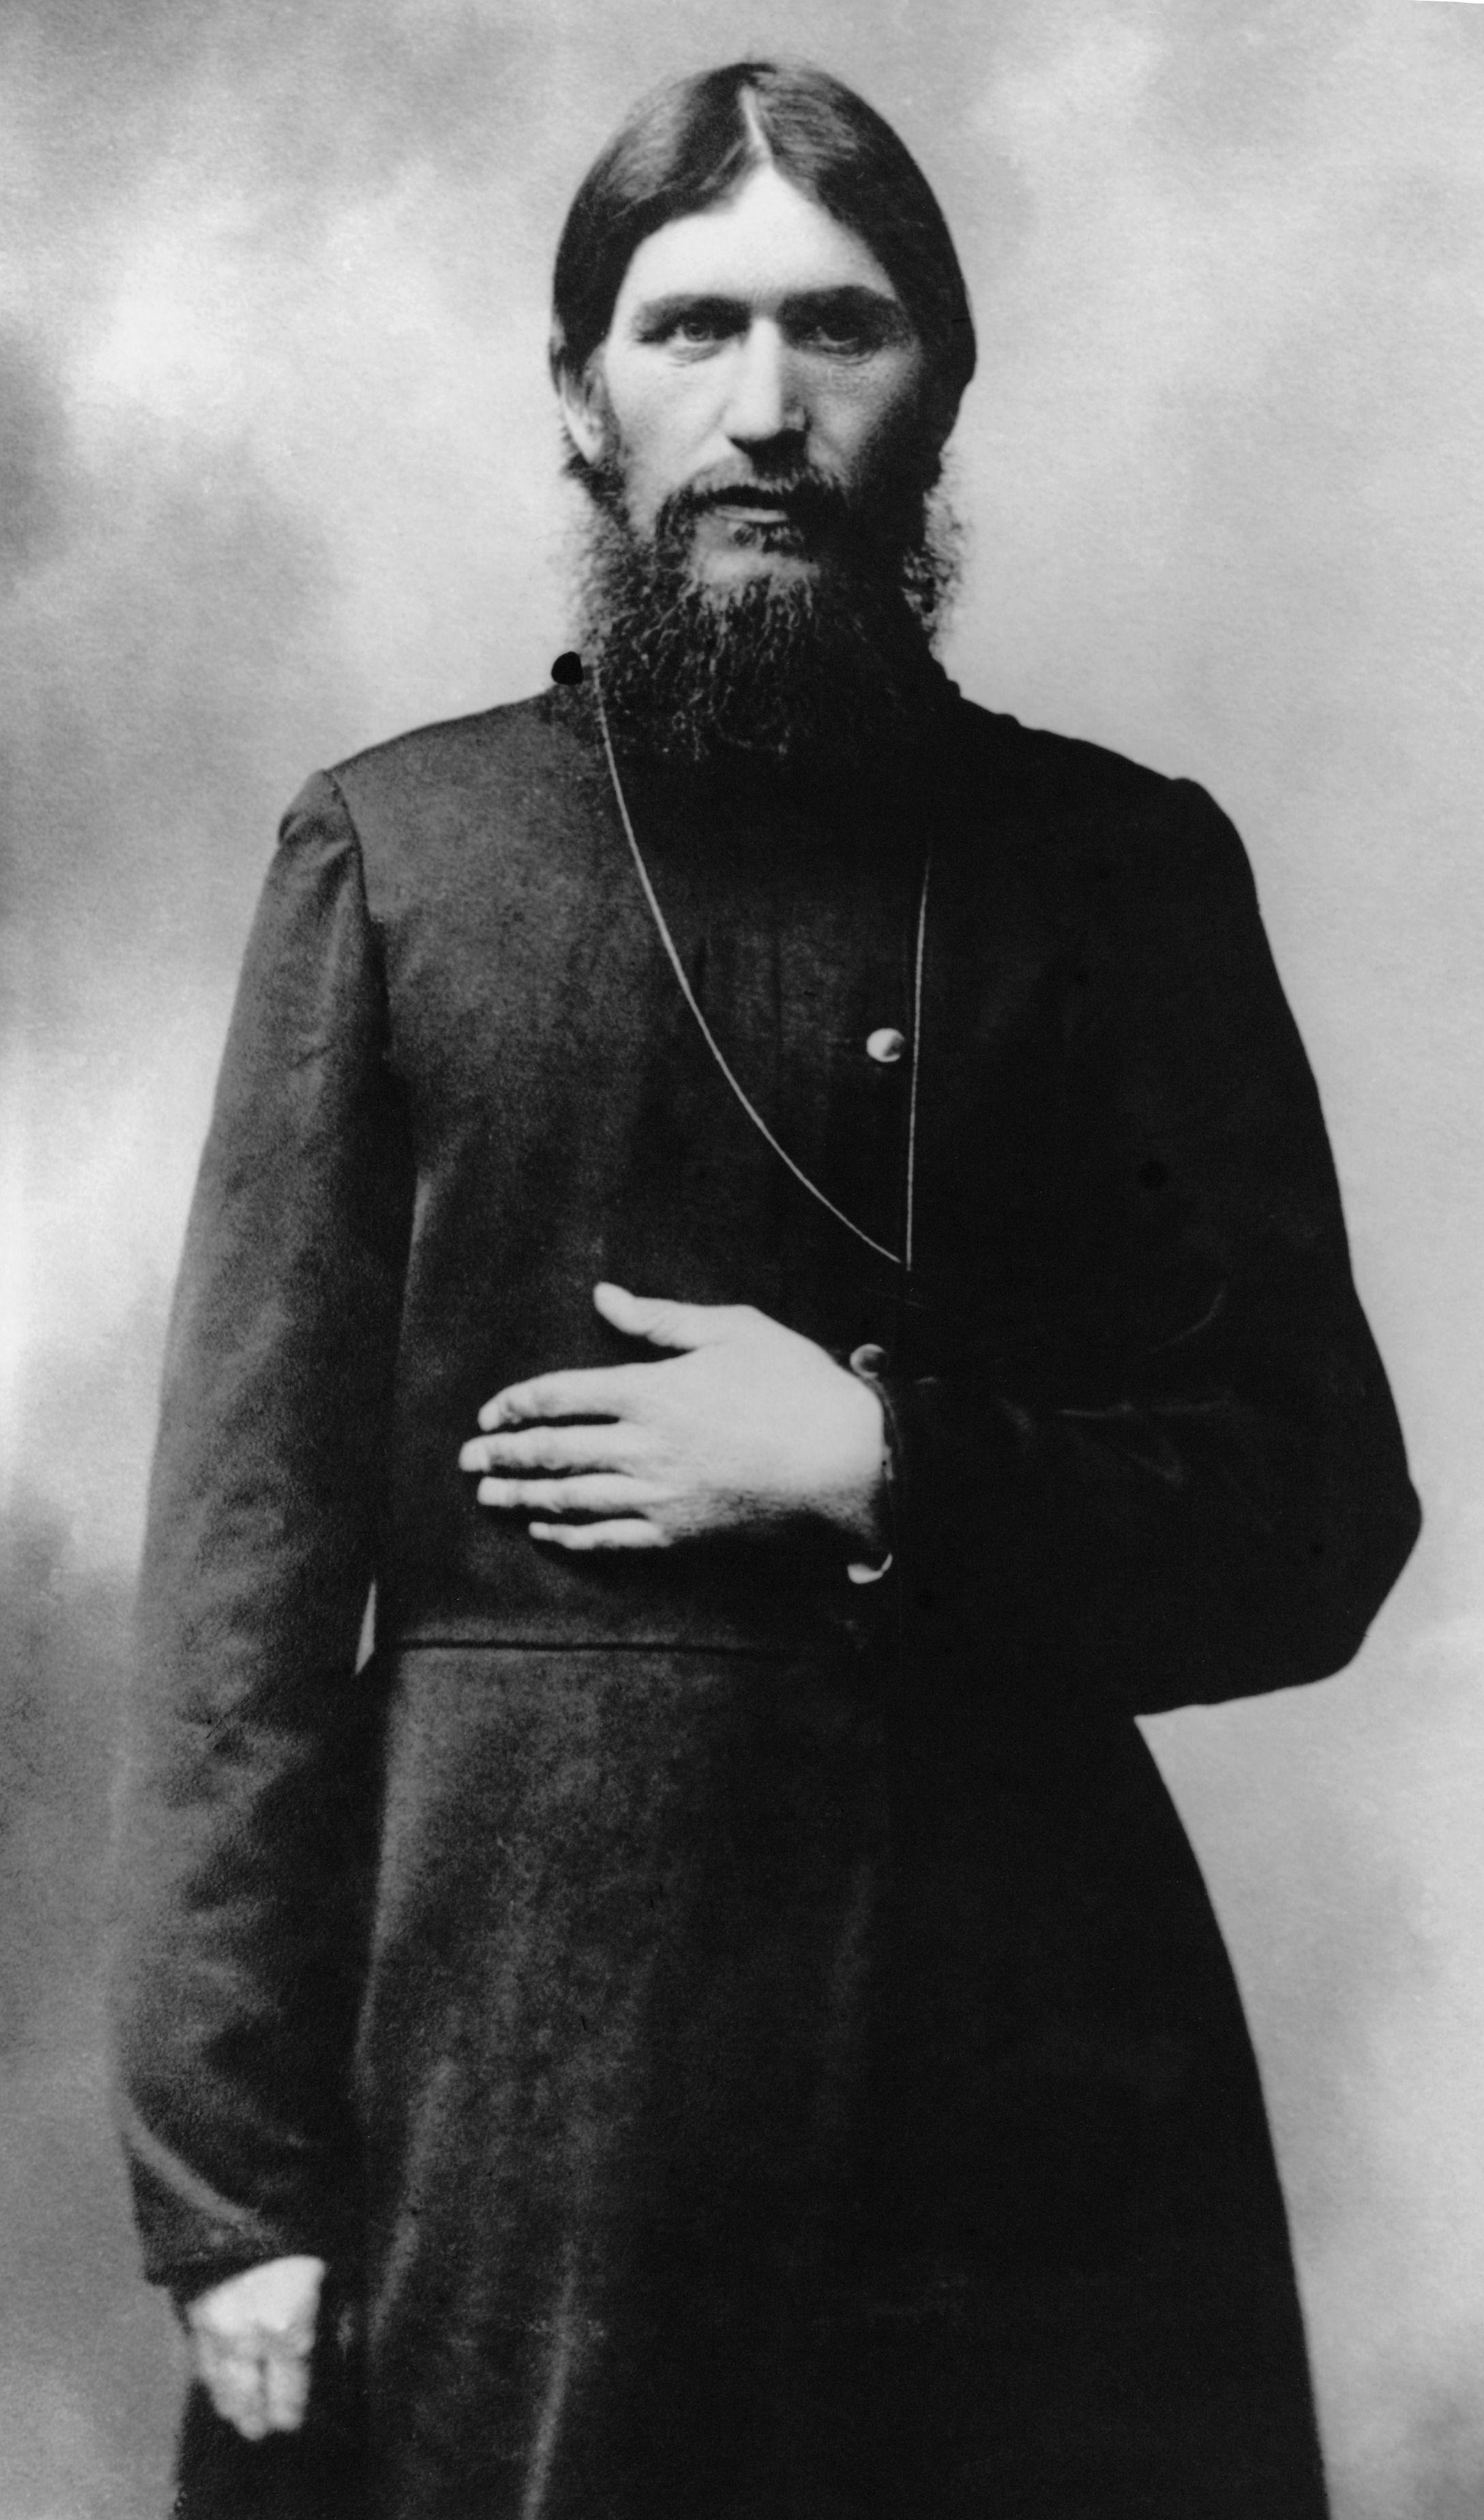 Rasputi Grigori Rasputin: